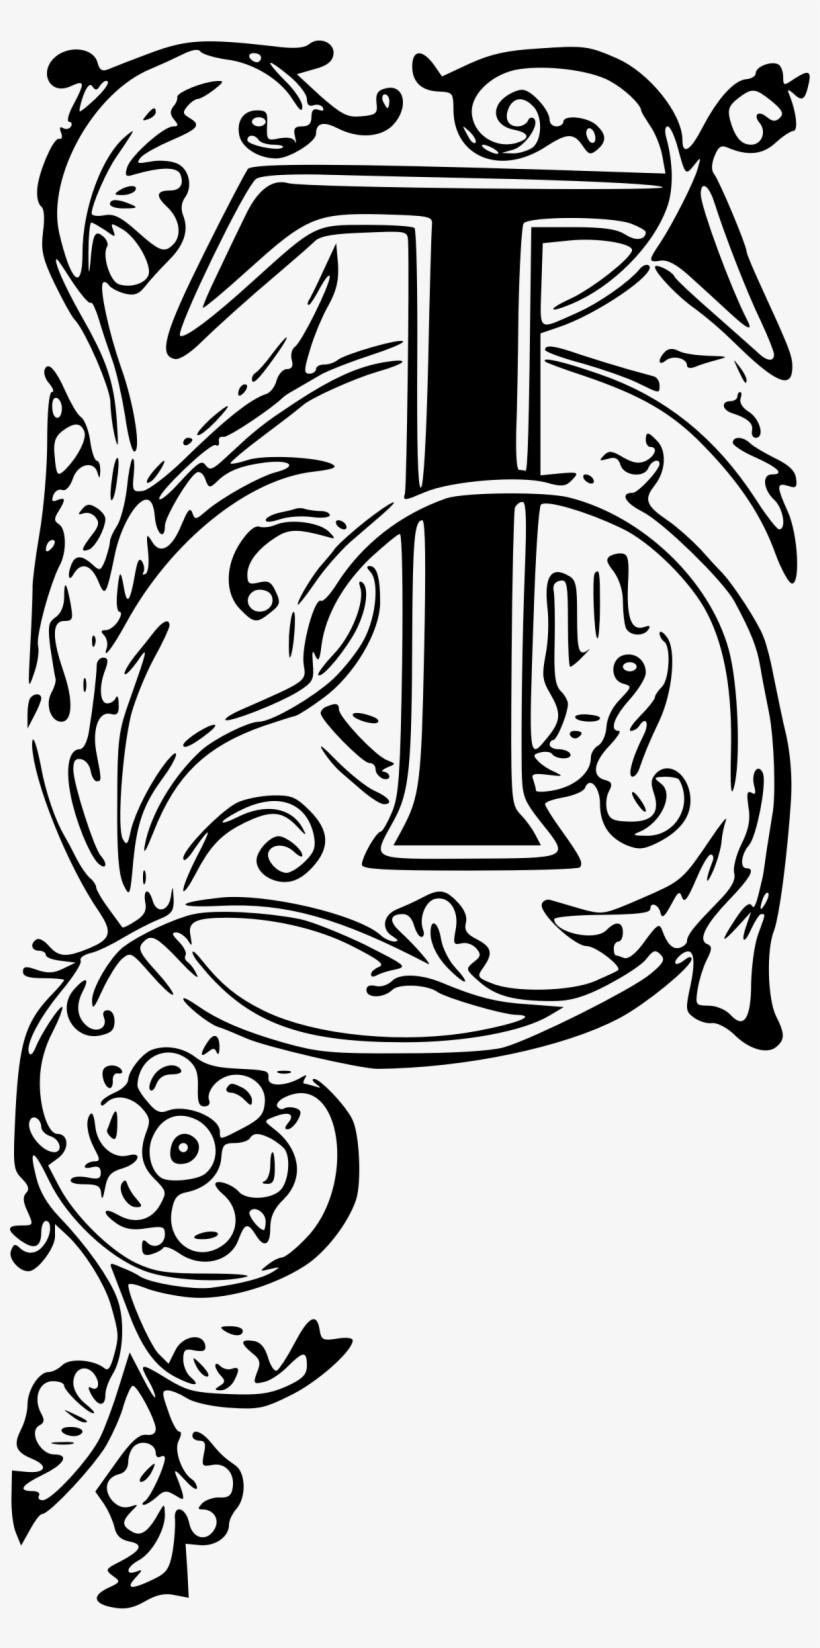 Letters In Fancy For Free Download On Mbtskoudsalg - Ornate Letter T